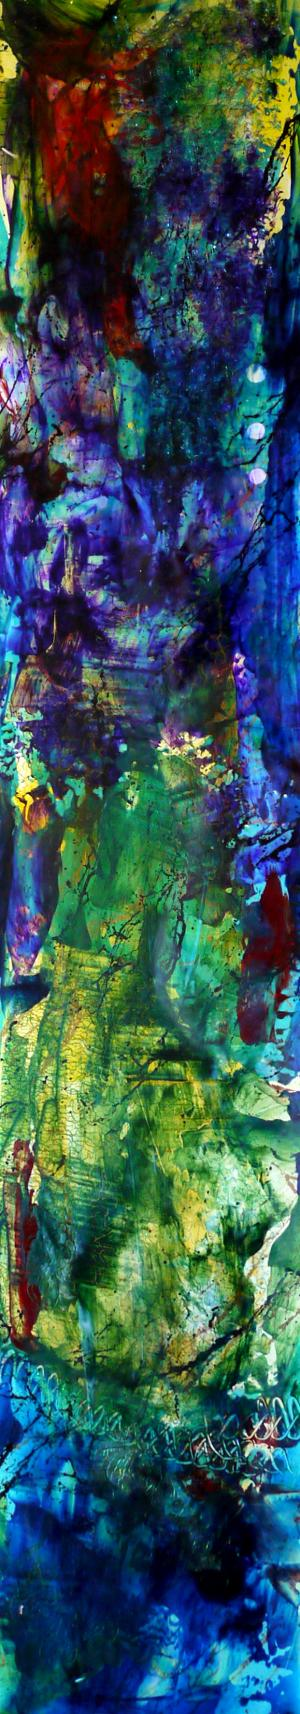 Midnight Jewel - Medium: Acrylic on Acrylic, Size: 32.75x6.25, Availability: Available